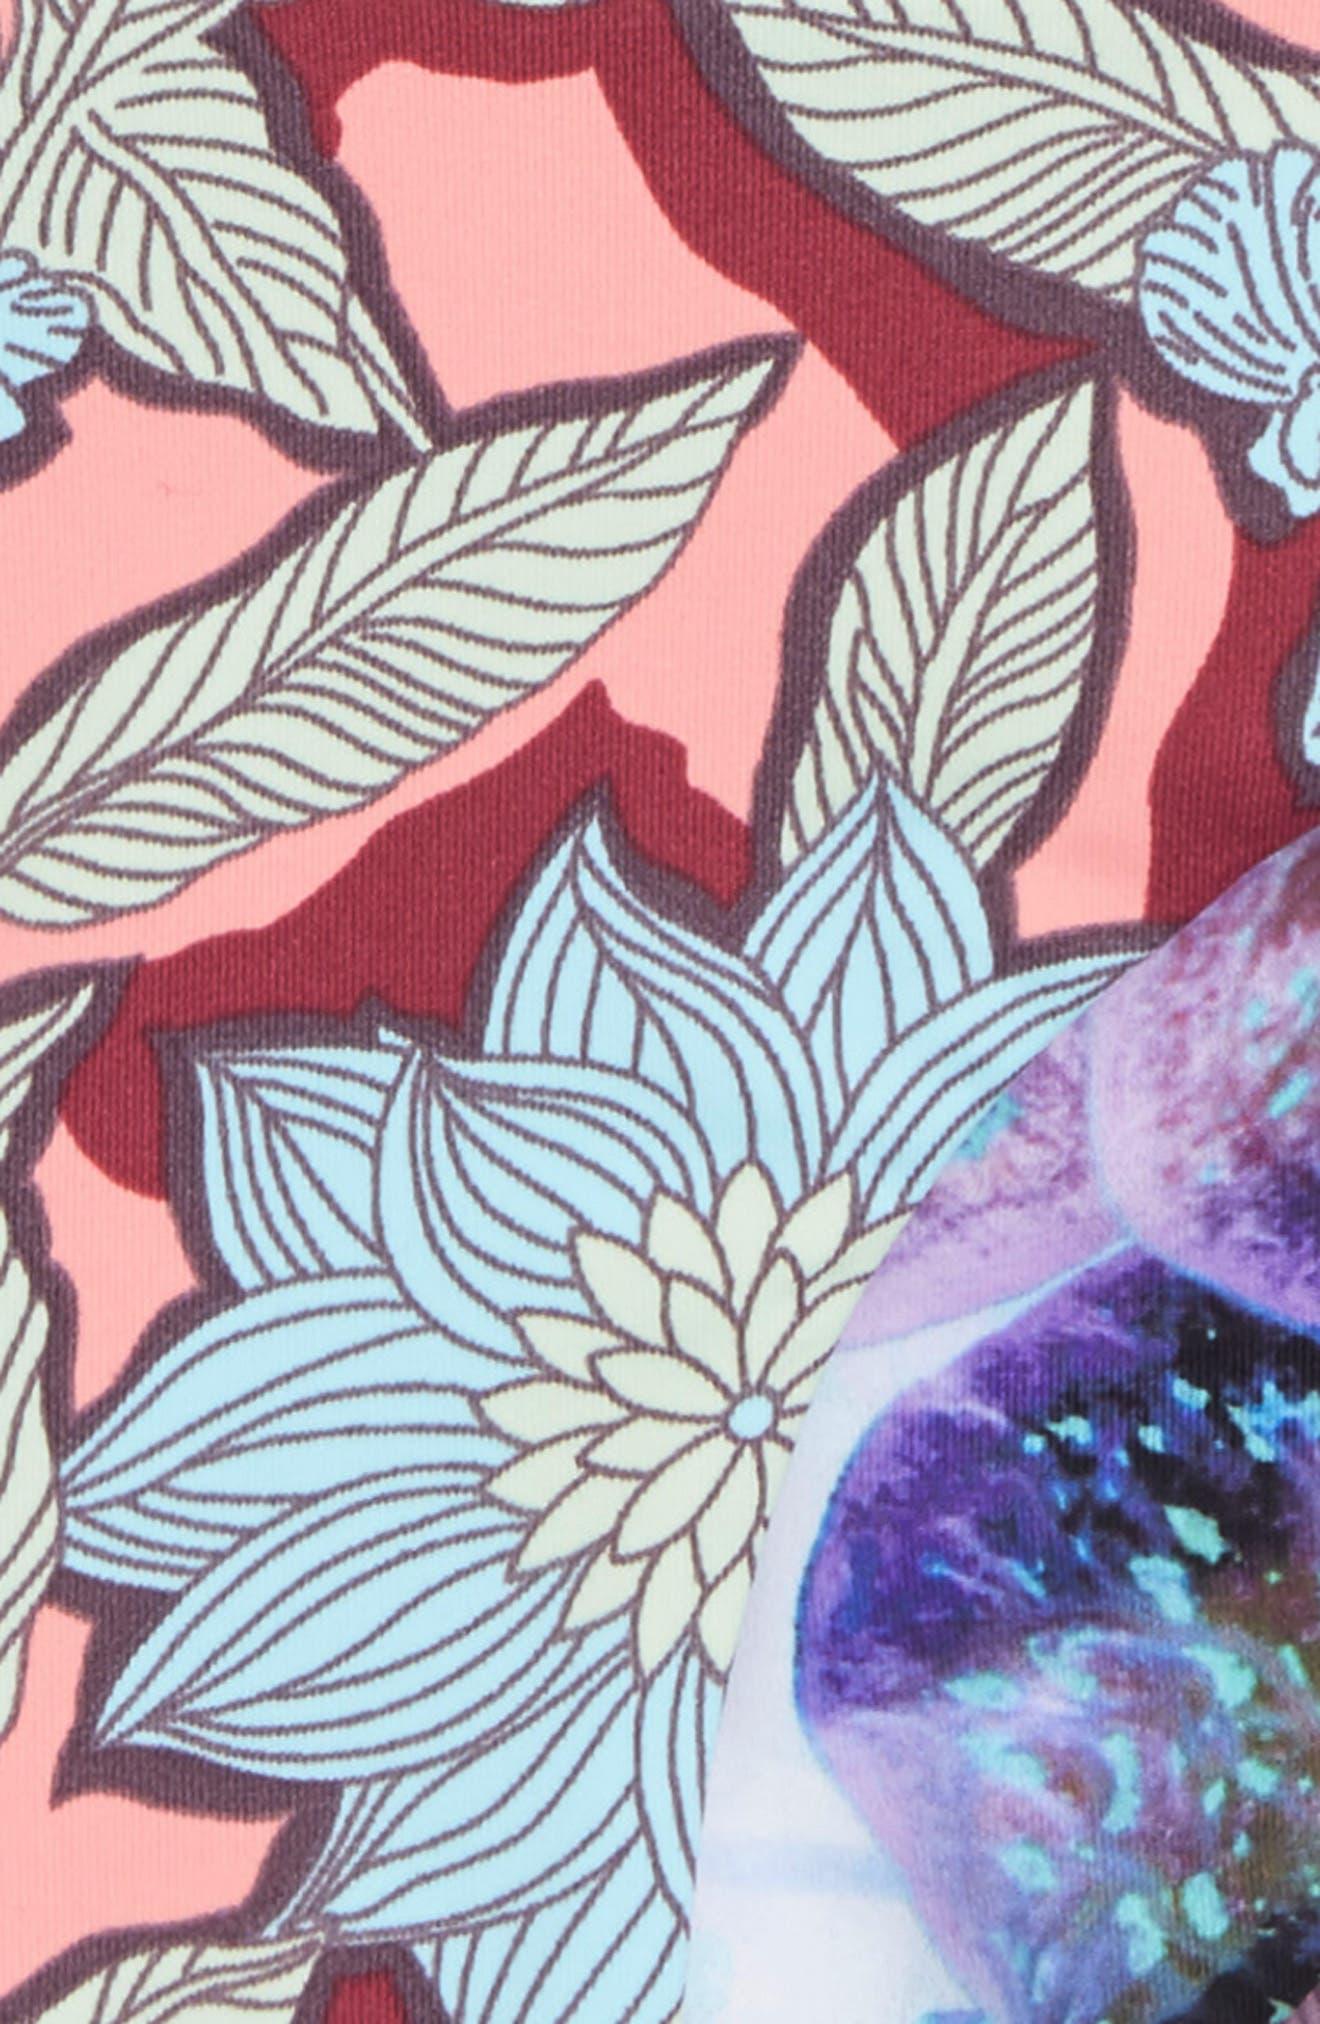 Gorgonita Spell Reversible Two-Piece Swimsuit,                             Alternate thumbnail 3, color,                             Multicolor